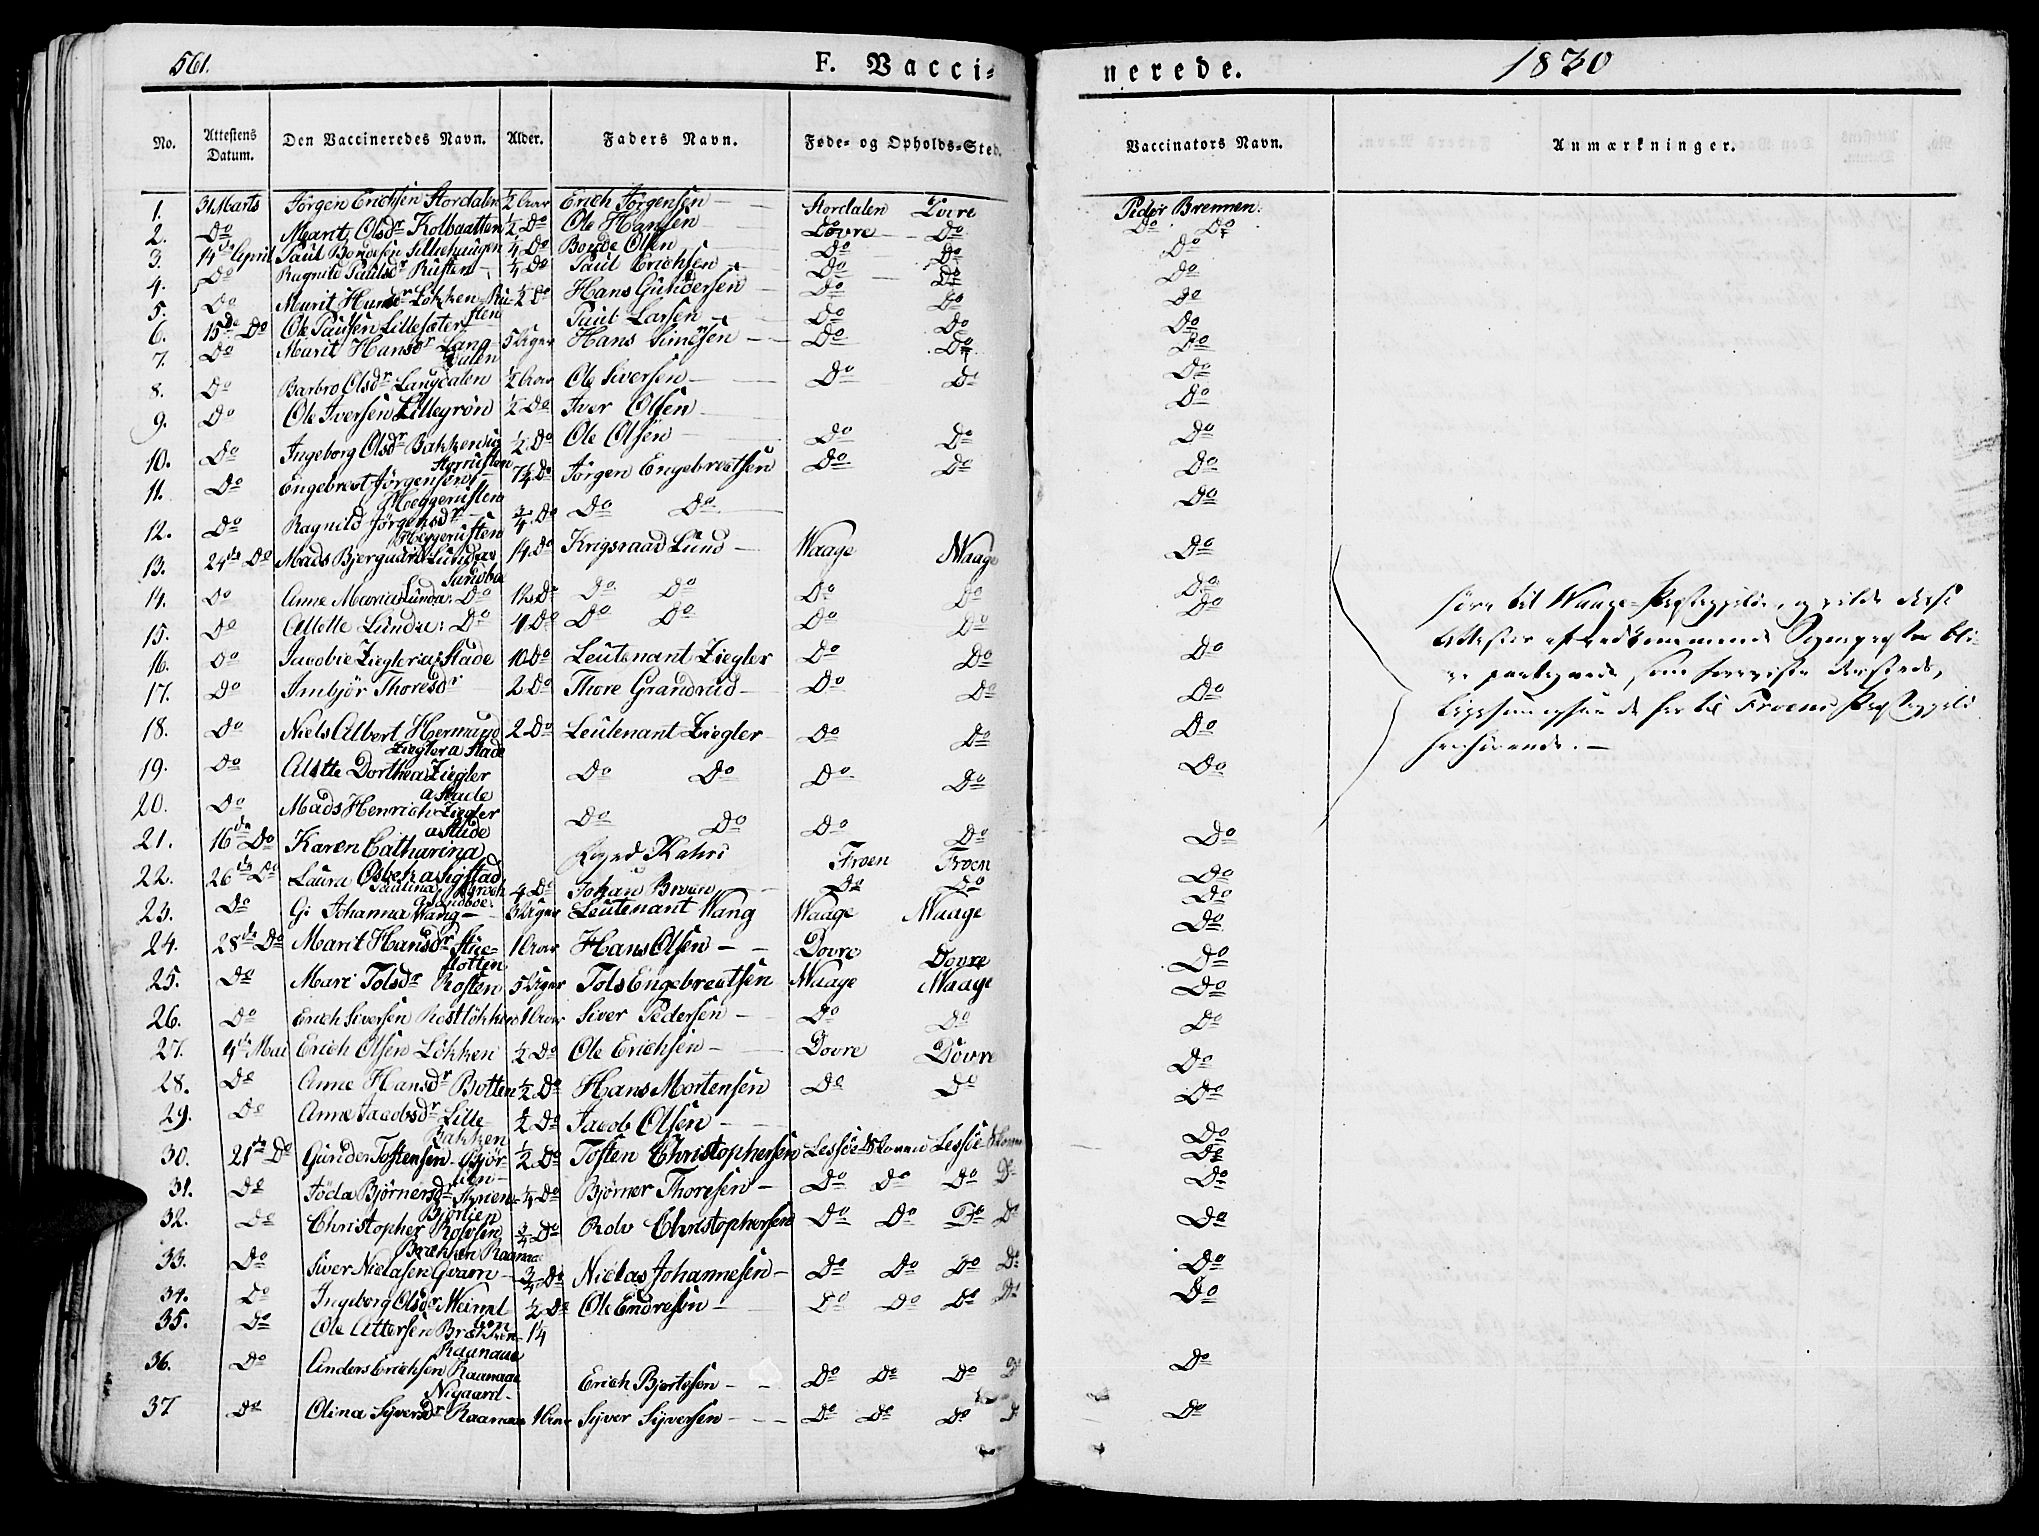 SAH, Lesja prestekontor, Ministerialbok nr. 5, 1830-1842, s. 561